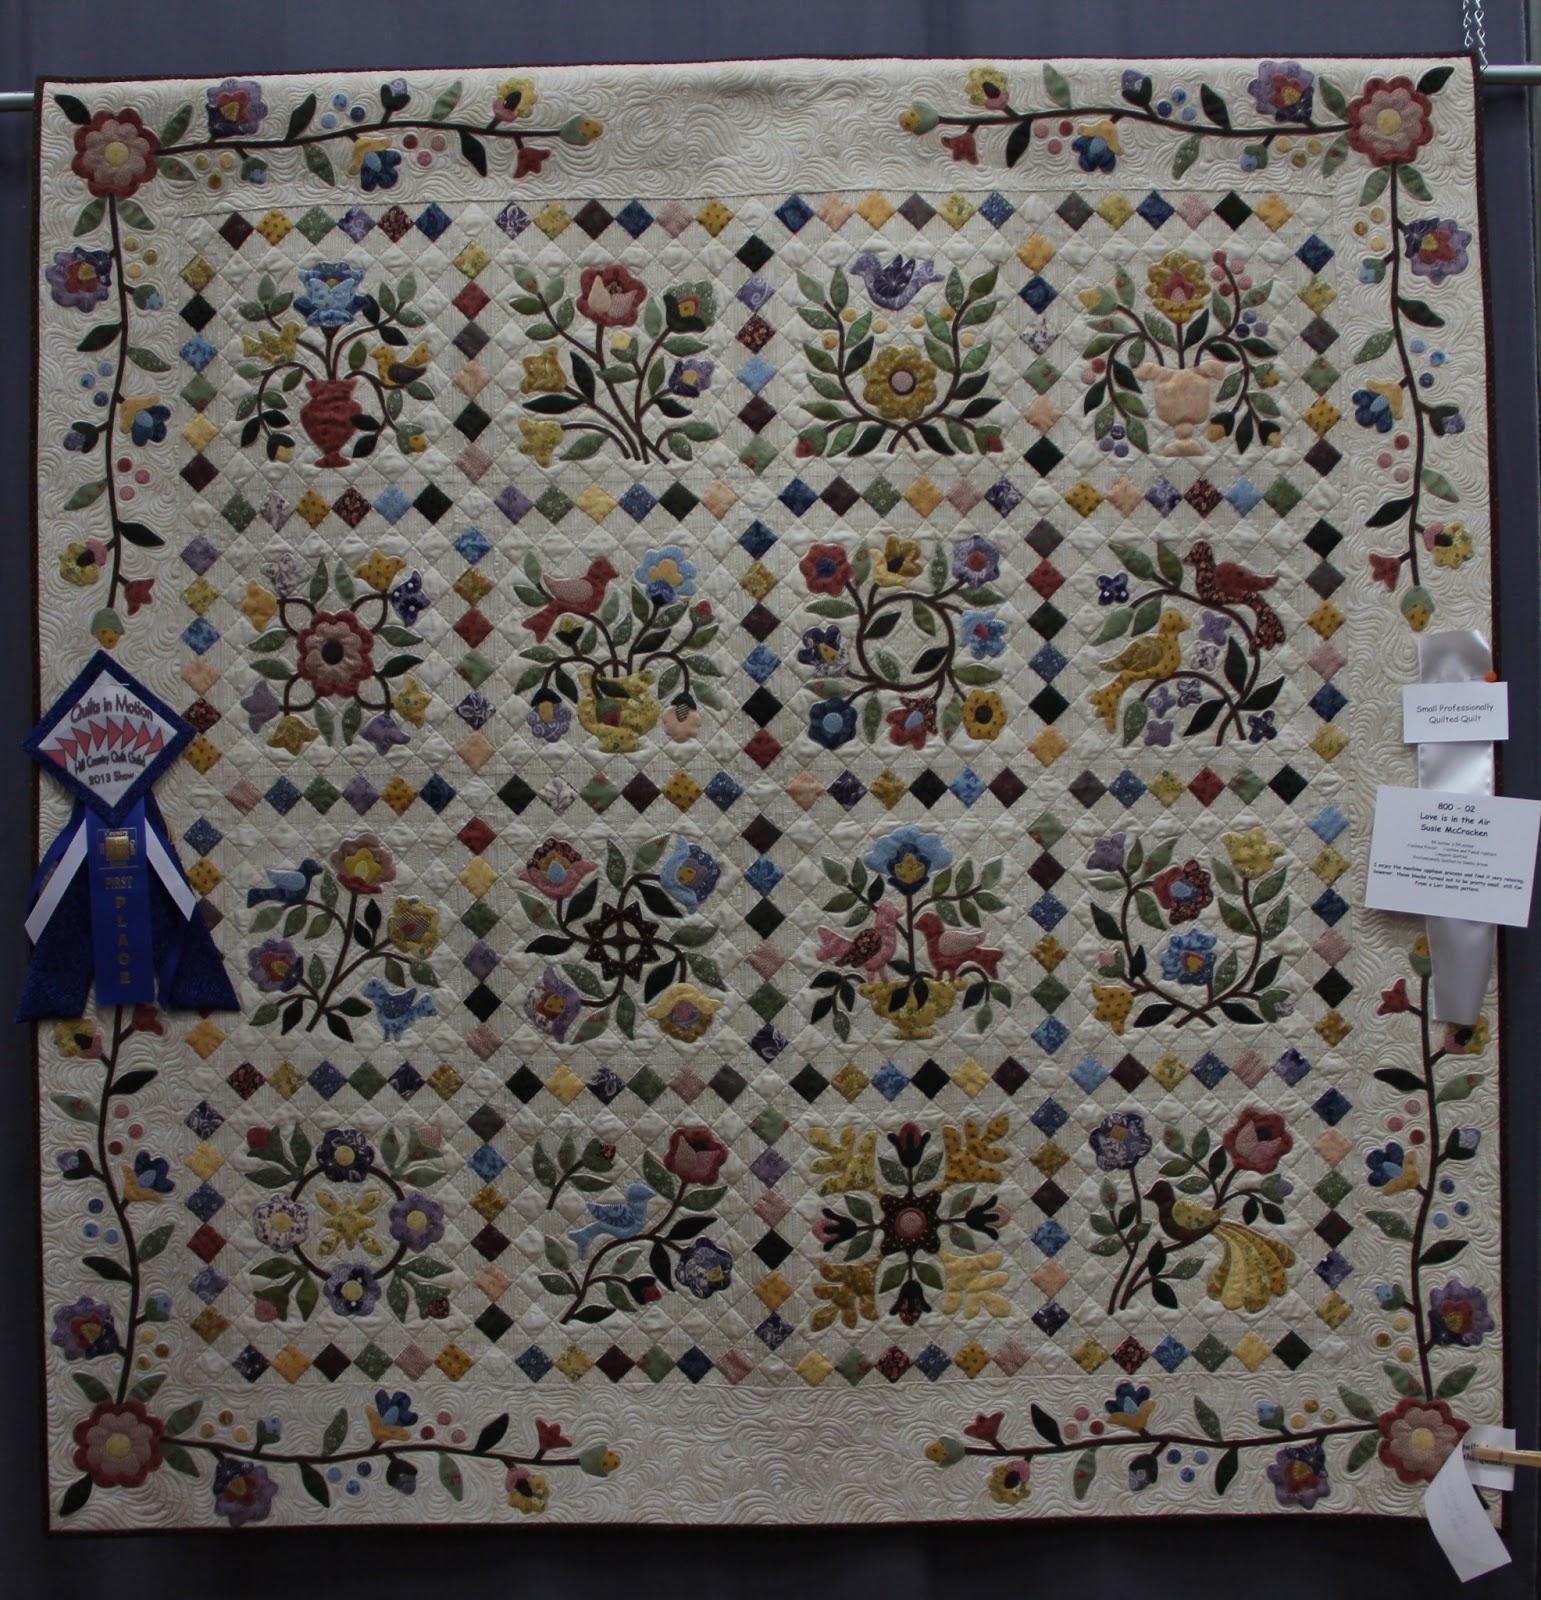 Sue Garman Quilt Patterns & By Sue Garman... The Absolute Bestest ... : sue garman quilt patterns - Adamdwight.com